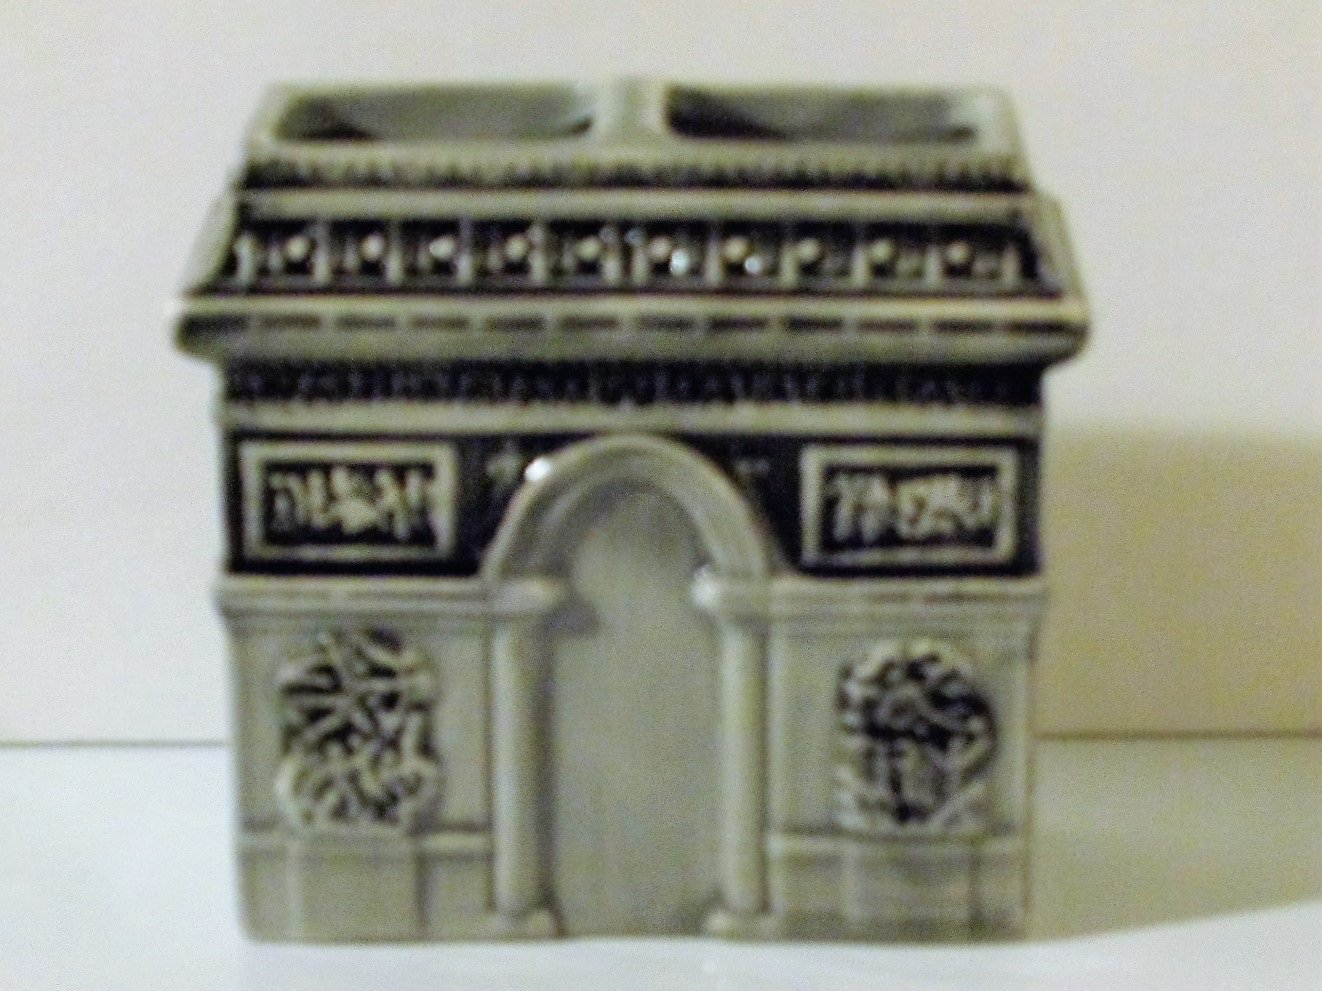 Paris Arc de Triomphe Toothbrush Holder French Bath Decor